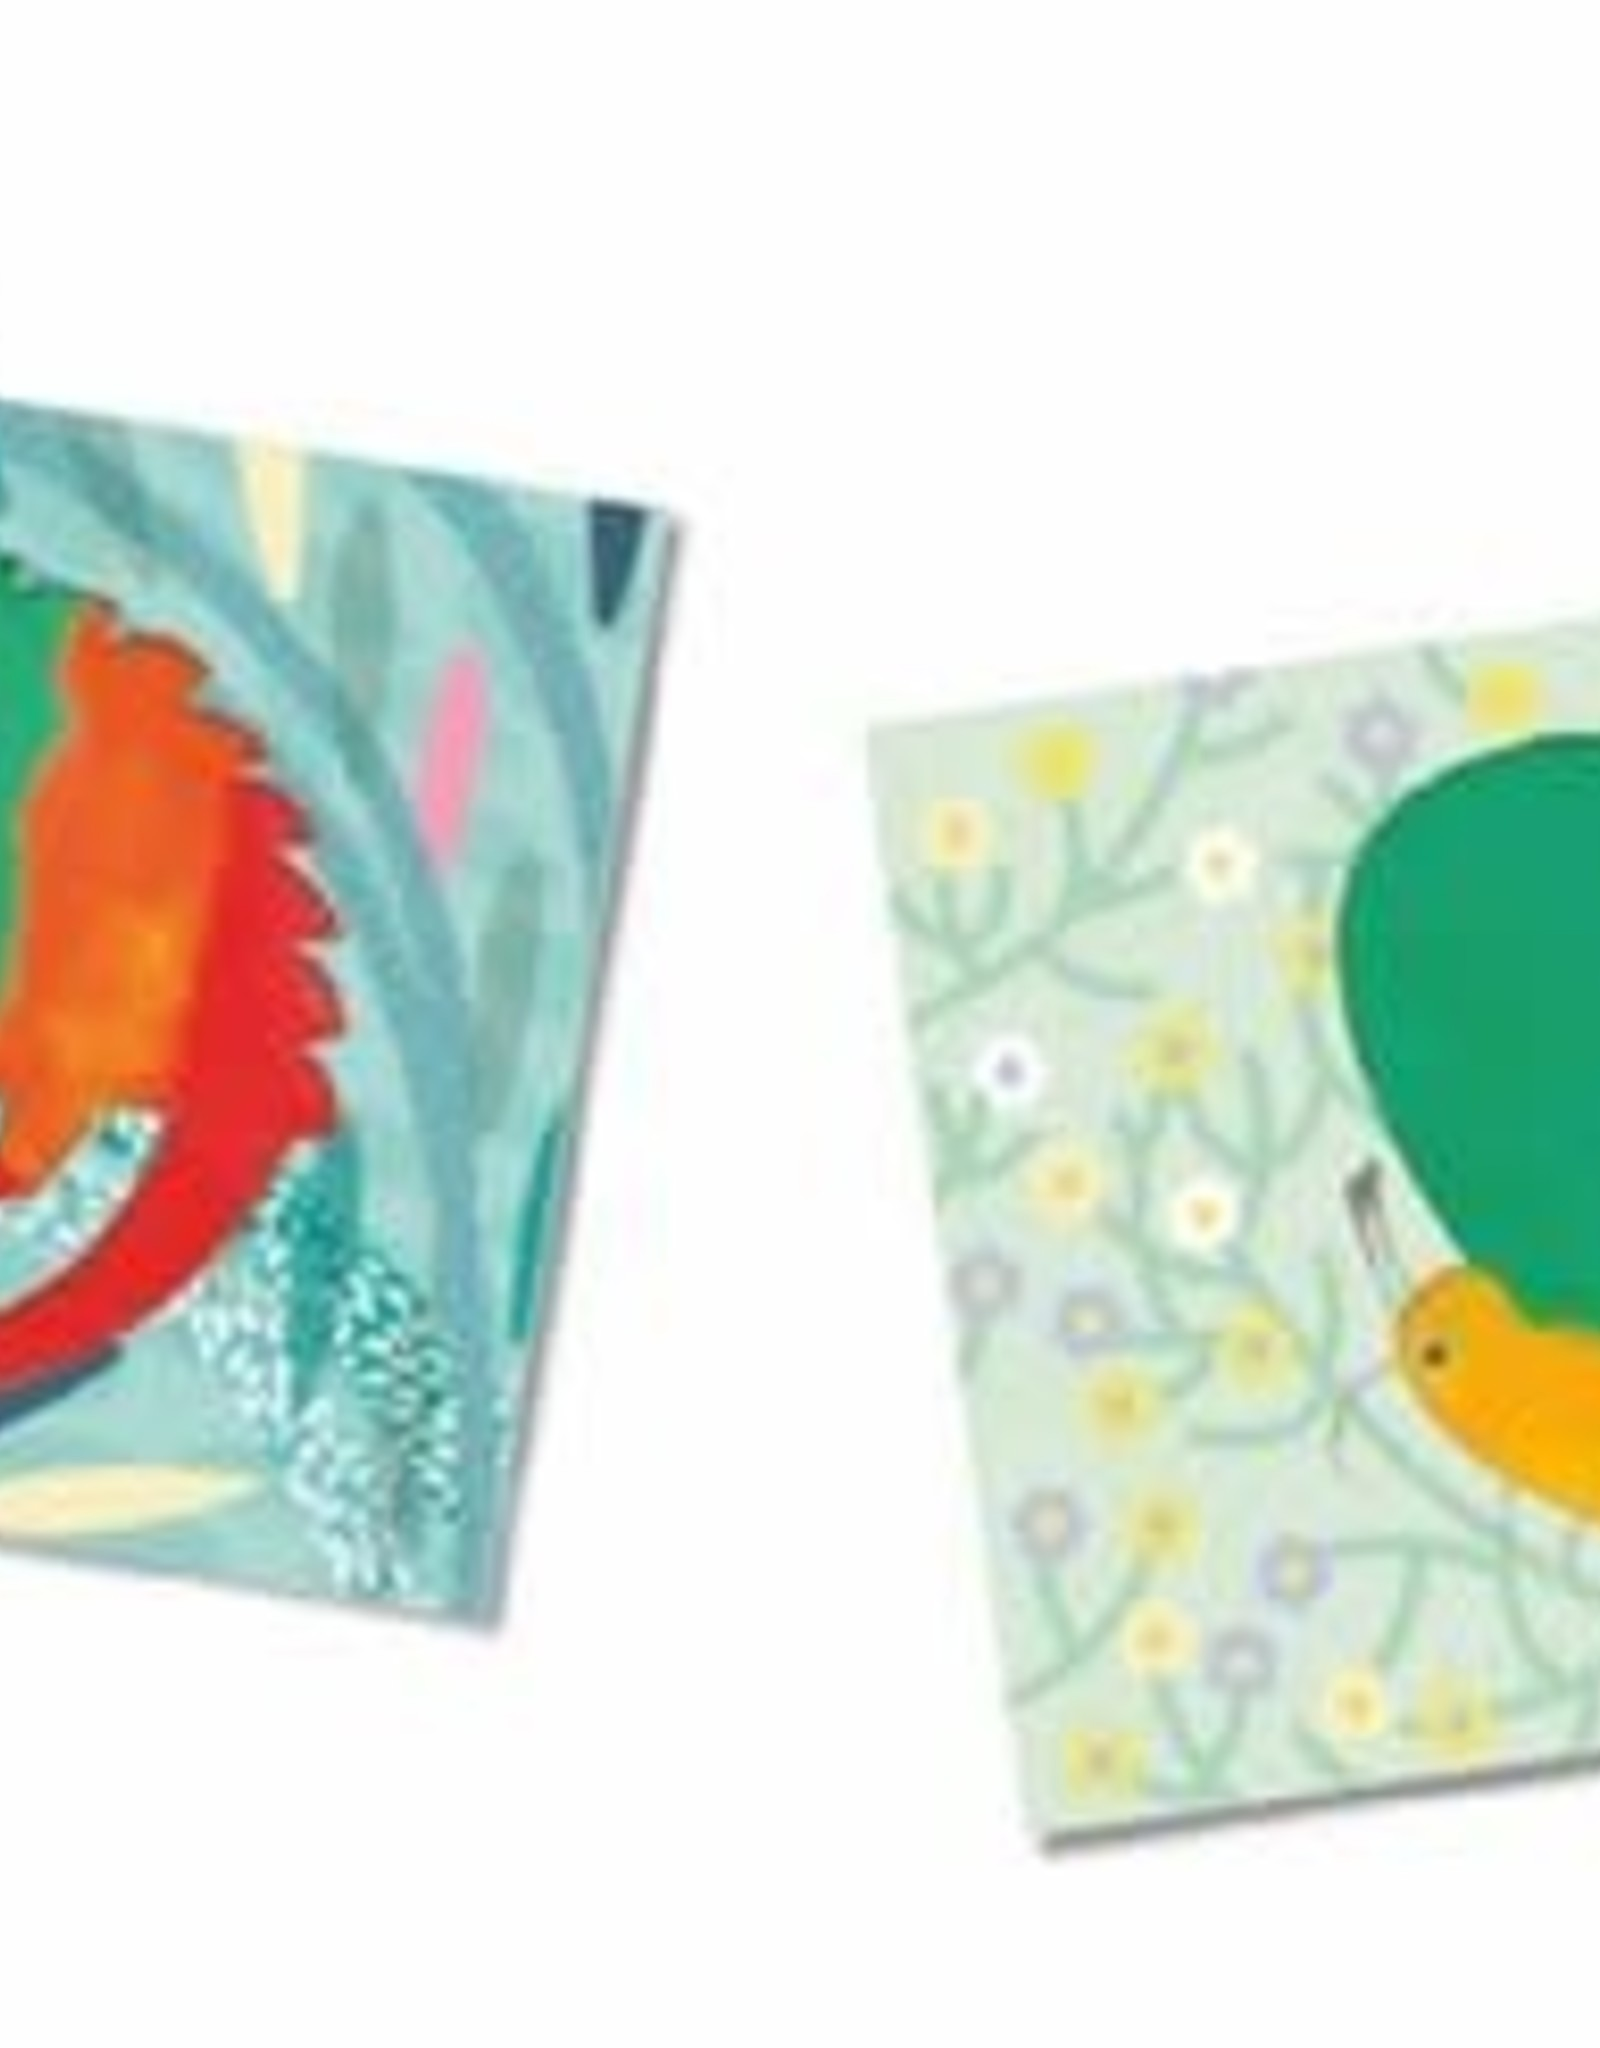 Djeco Craft Kit Finger Painting Mess-Free 18m+